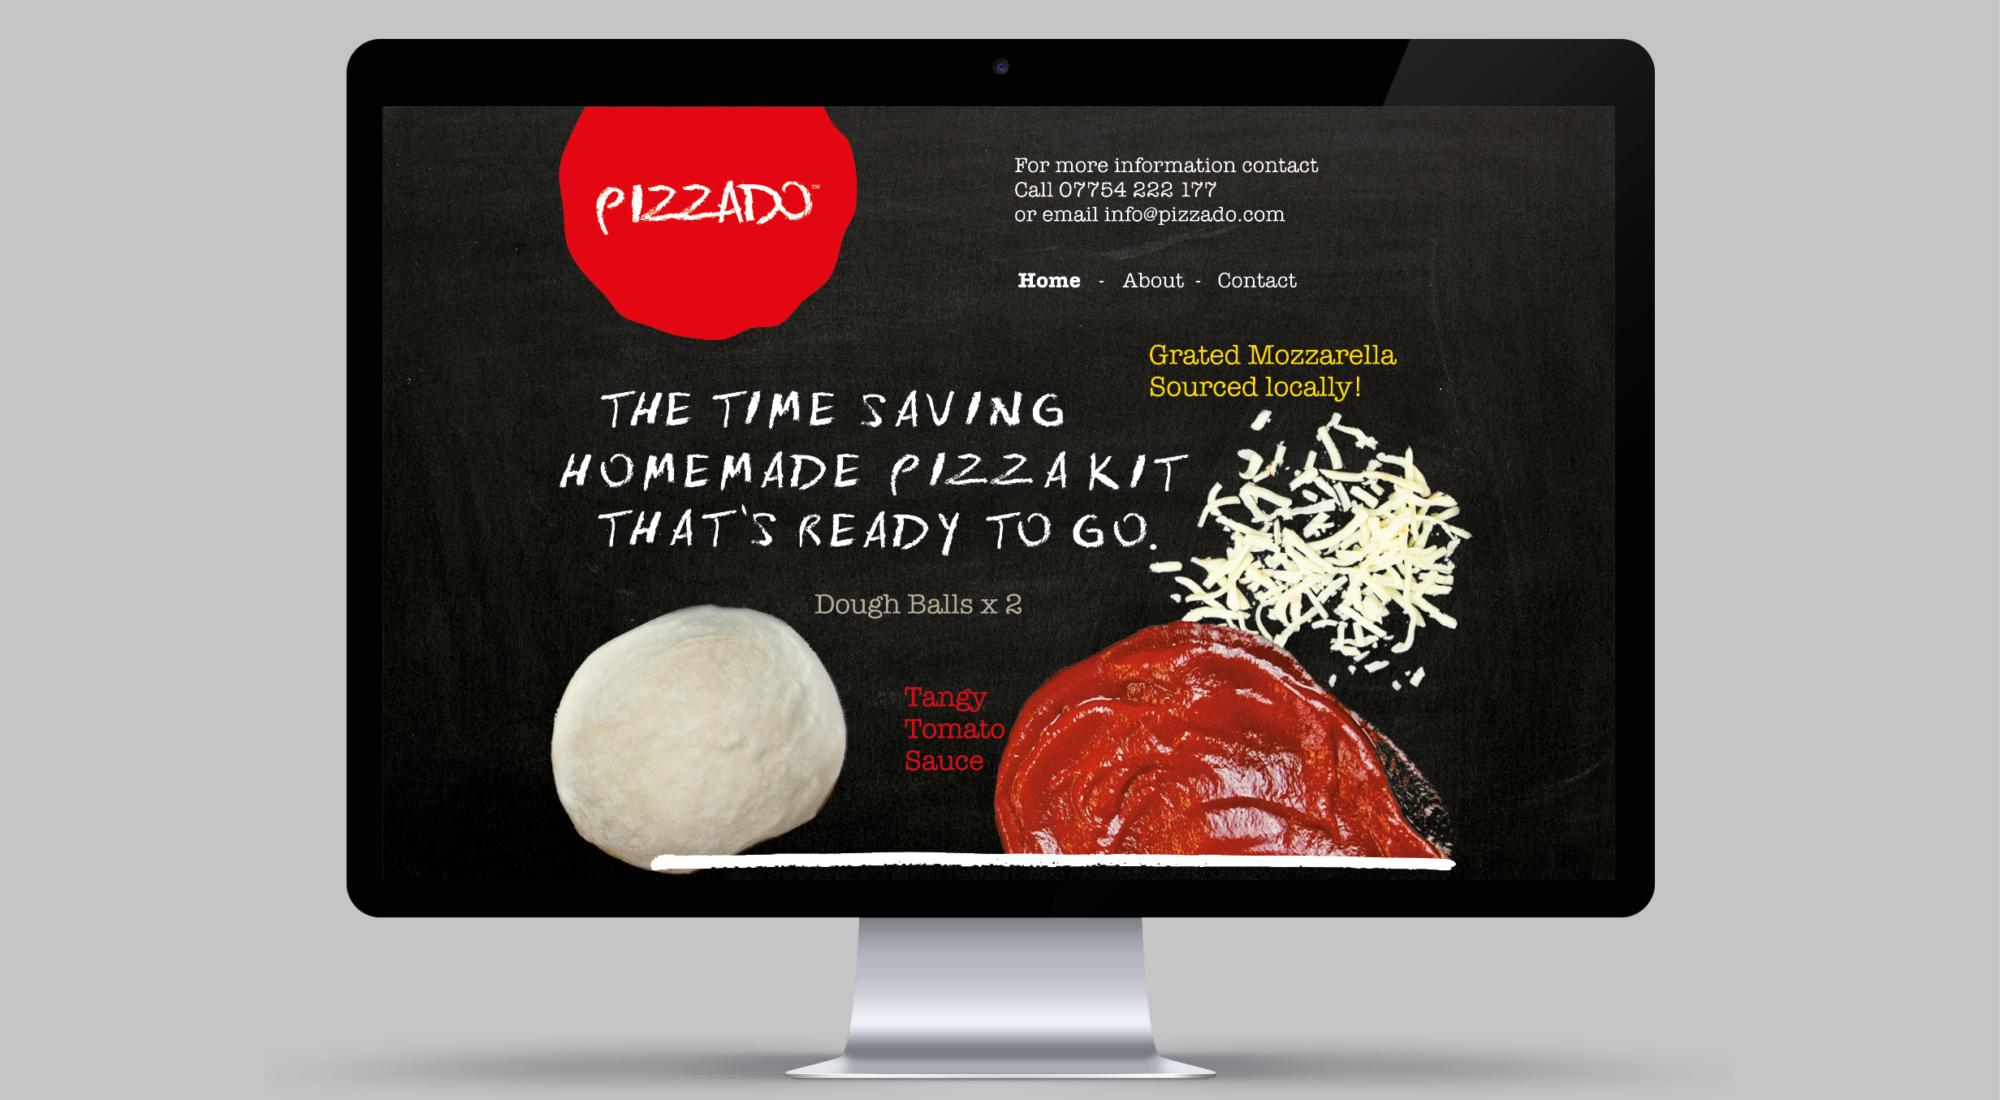 https://alanjacksondesign.co.uk/wp-content/uploads/2021/09/pizzado-img3.jpg